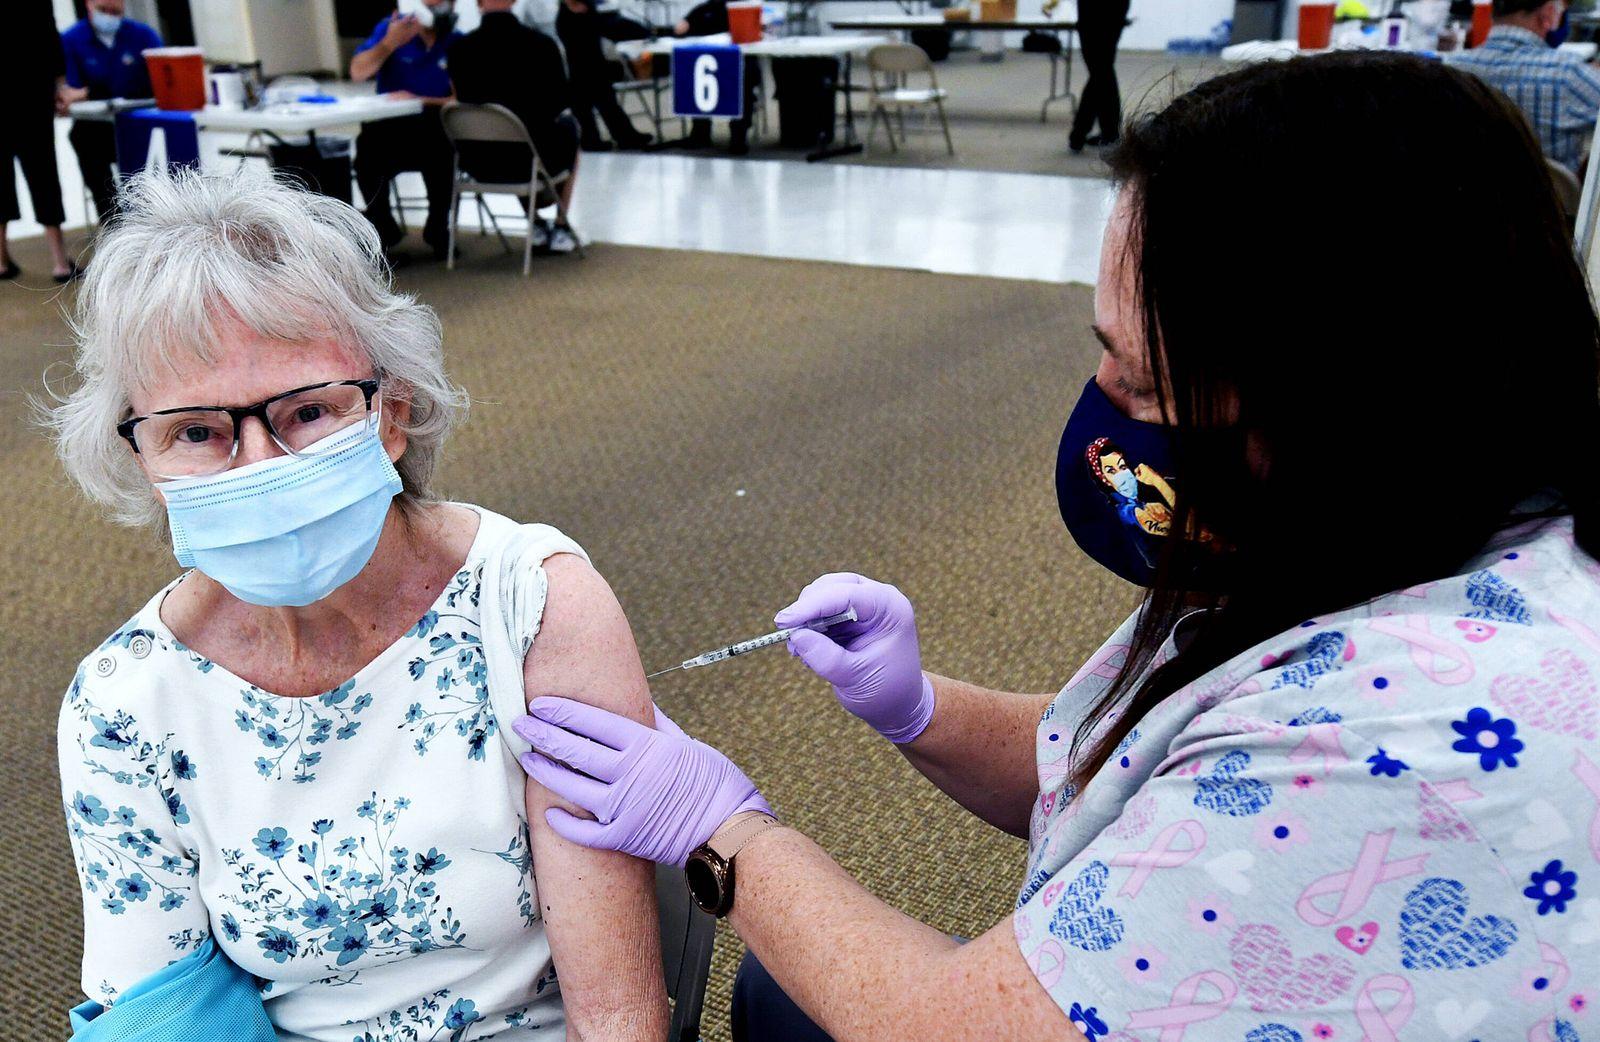 January 29, 2021, Leesburg, Florida, United States: Nurse Lacinda Snowberger gives Priscilla Lockhart a shot of the Pfi